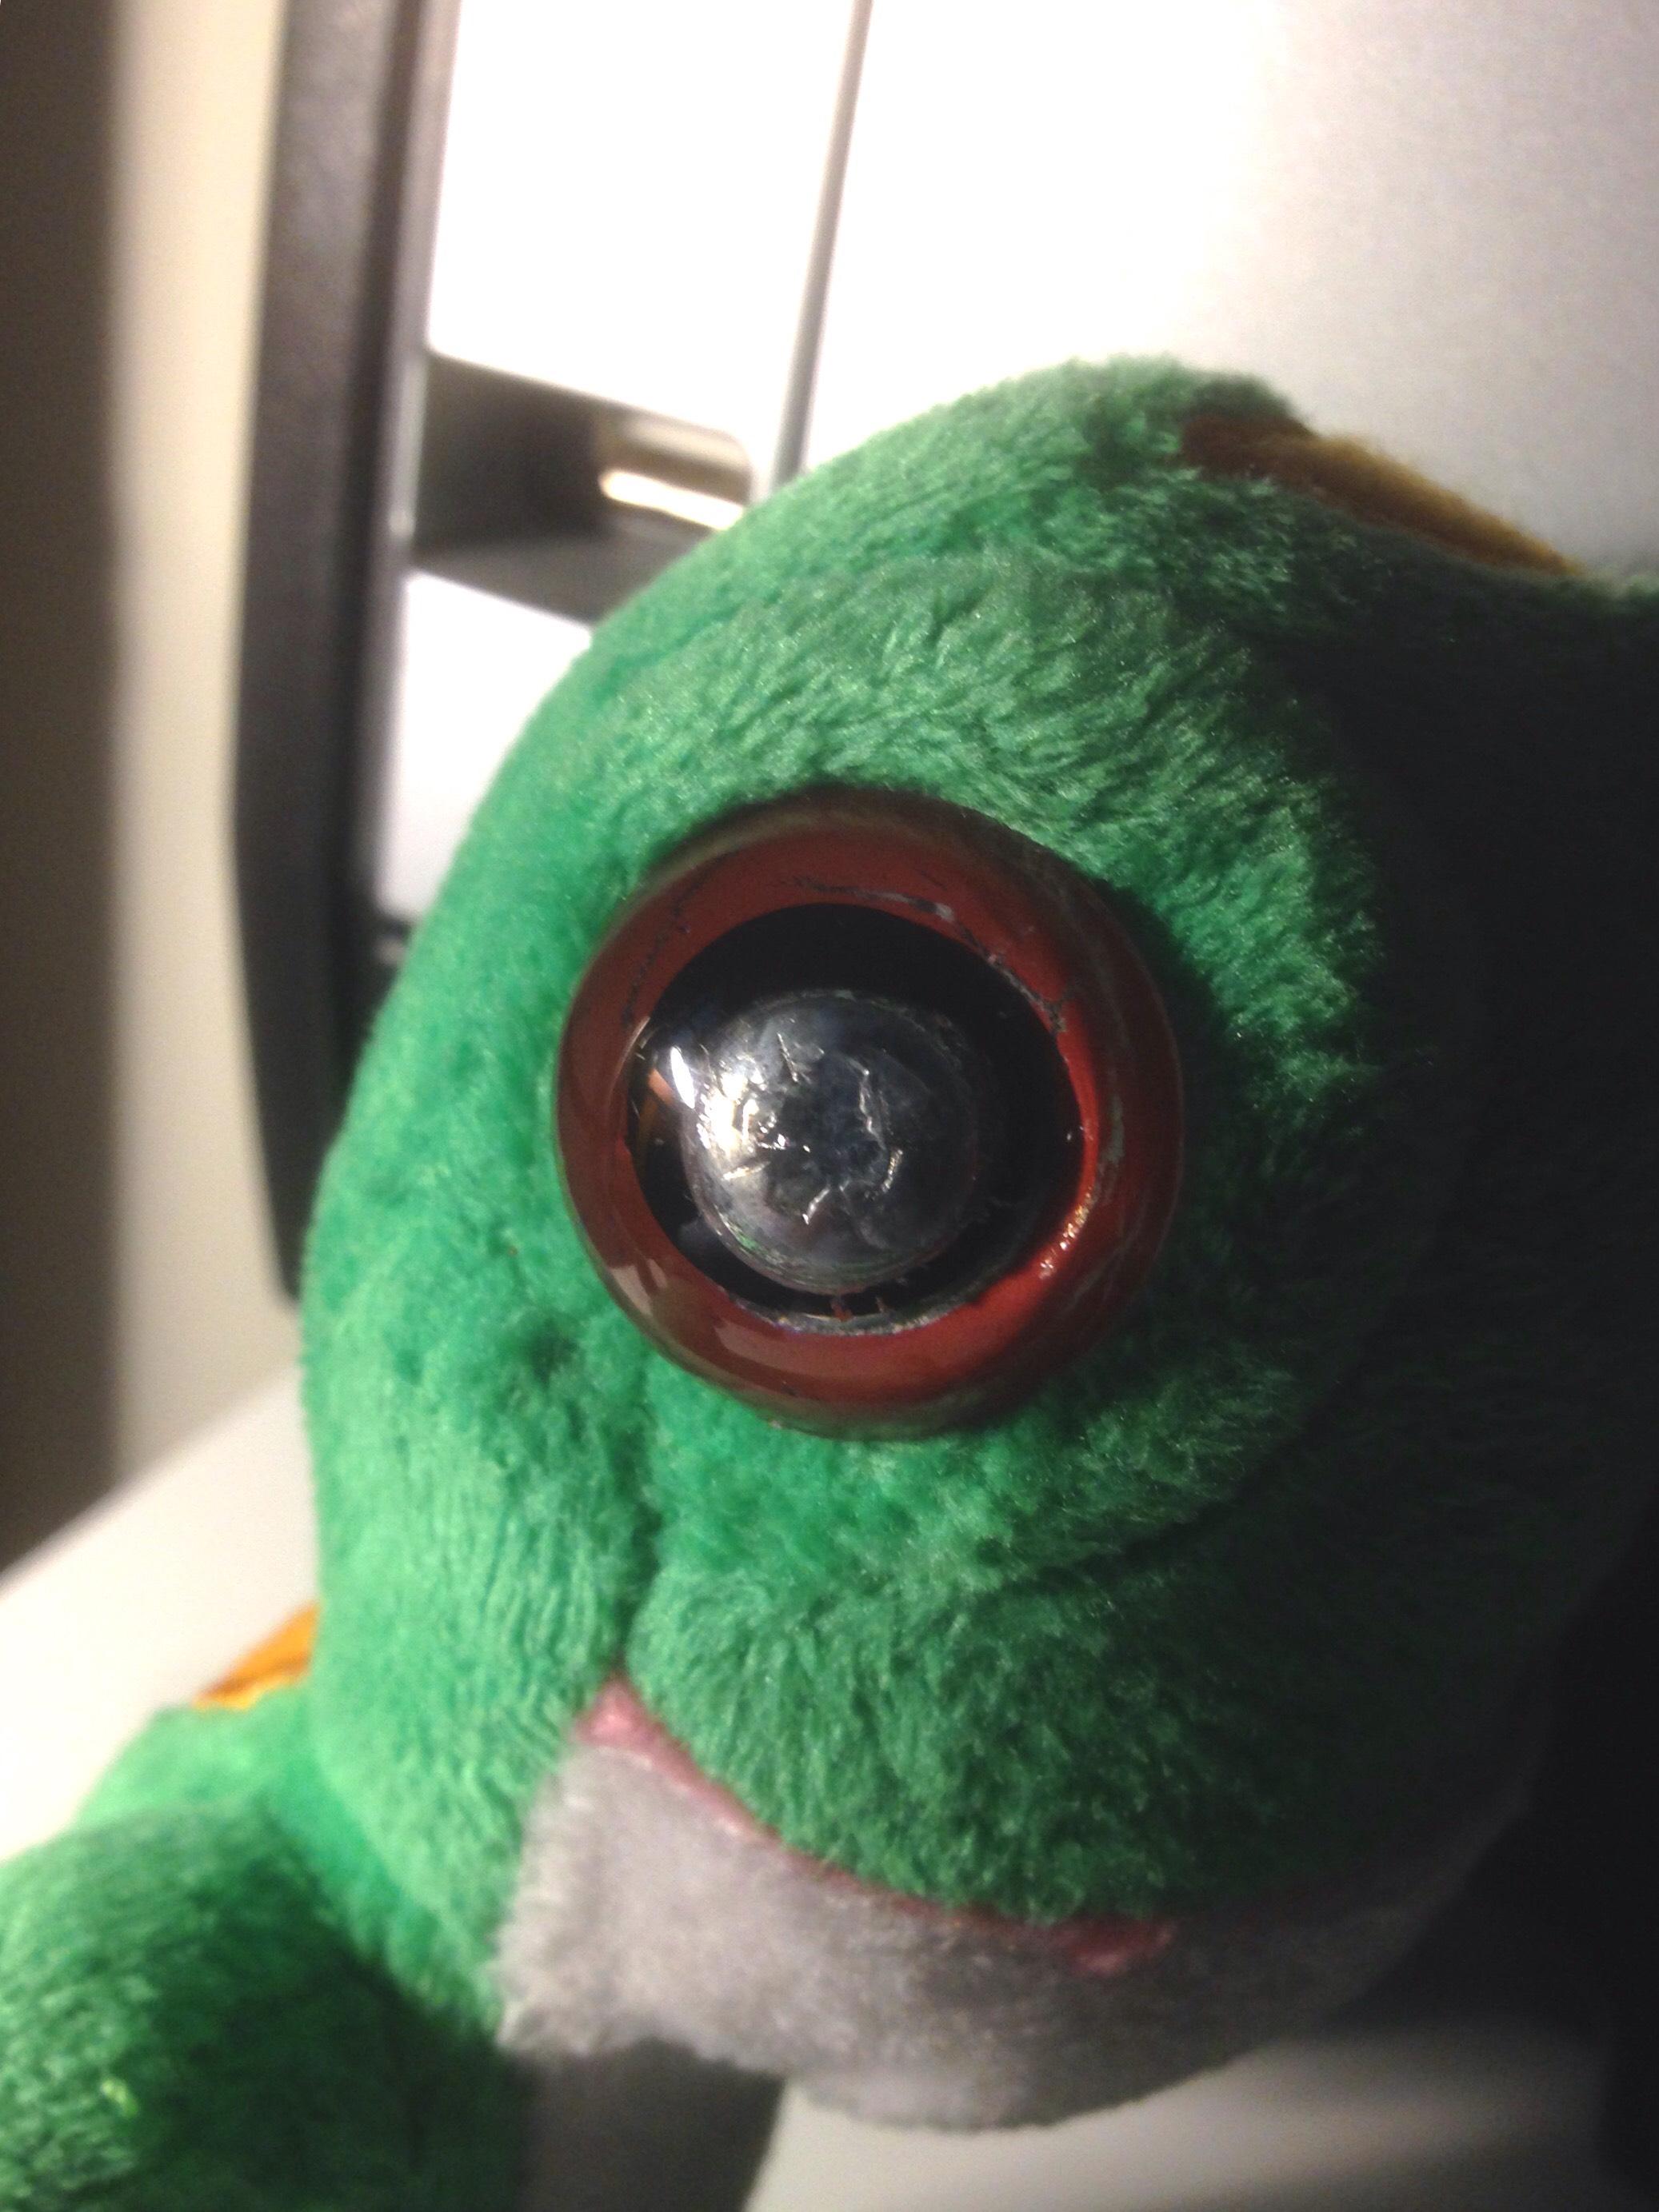 Picture of Cyborg Stuffed Animal Eye Repair